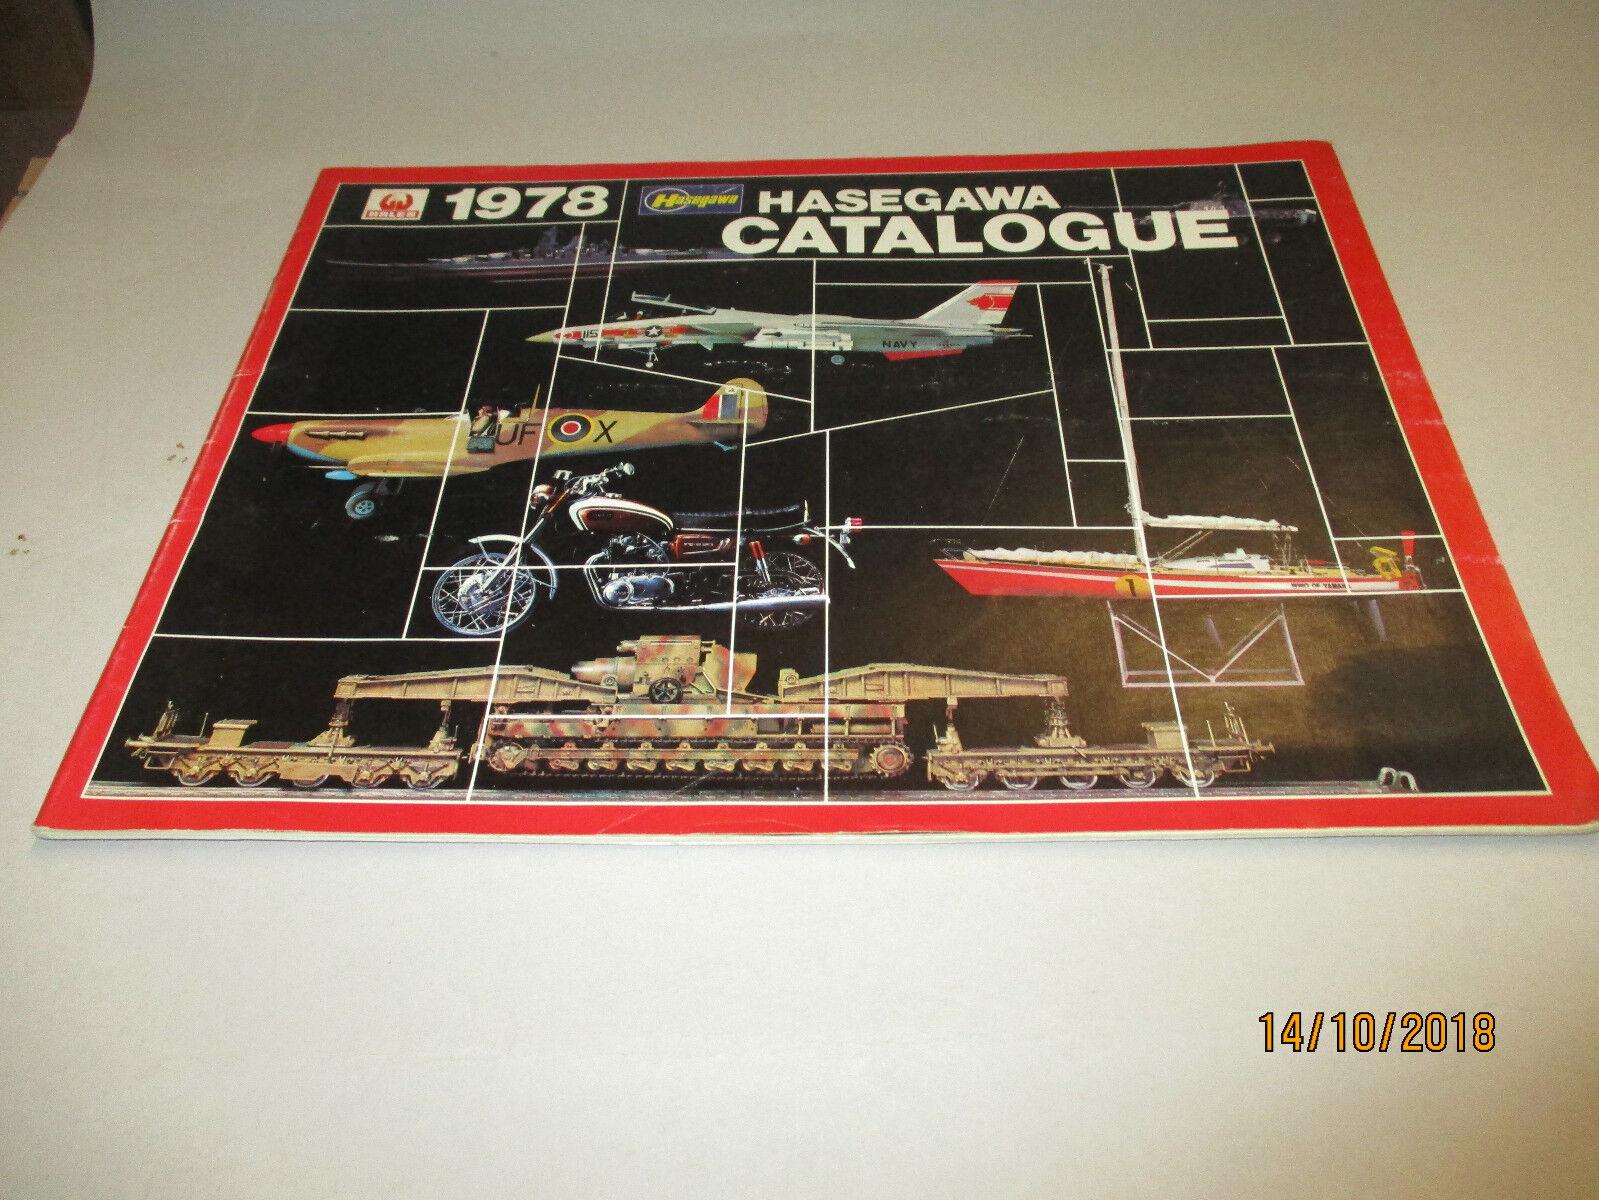 Hasegawa MODELLO KIT: catalogo 1978